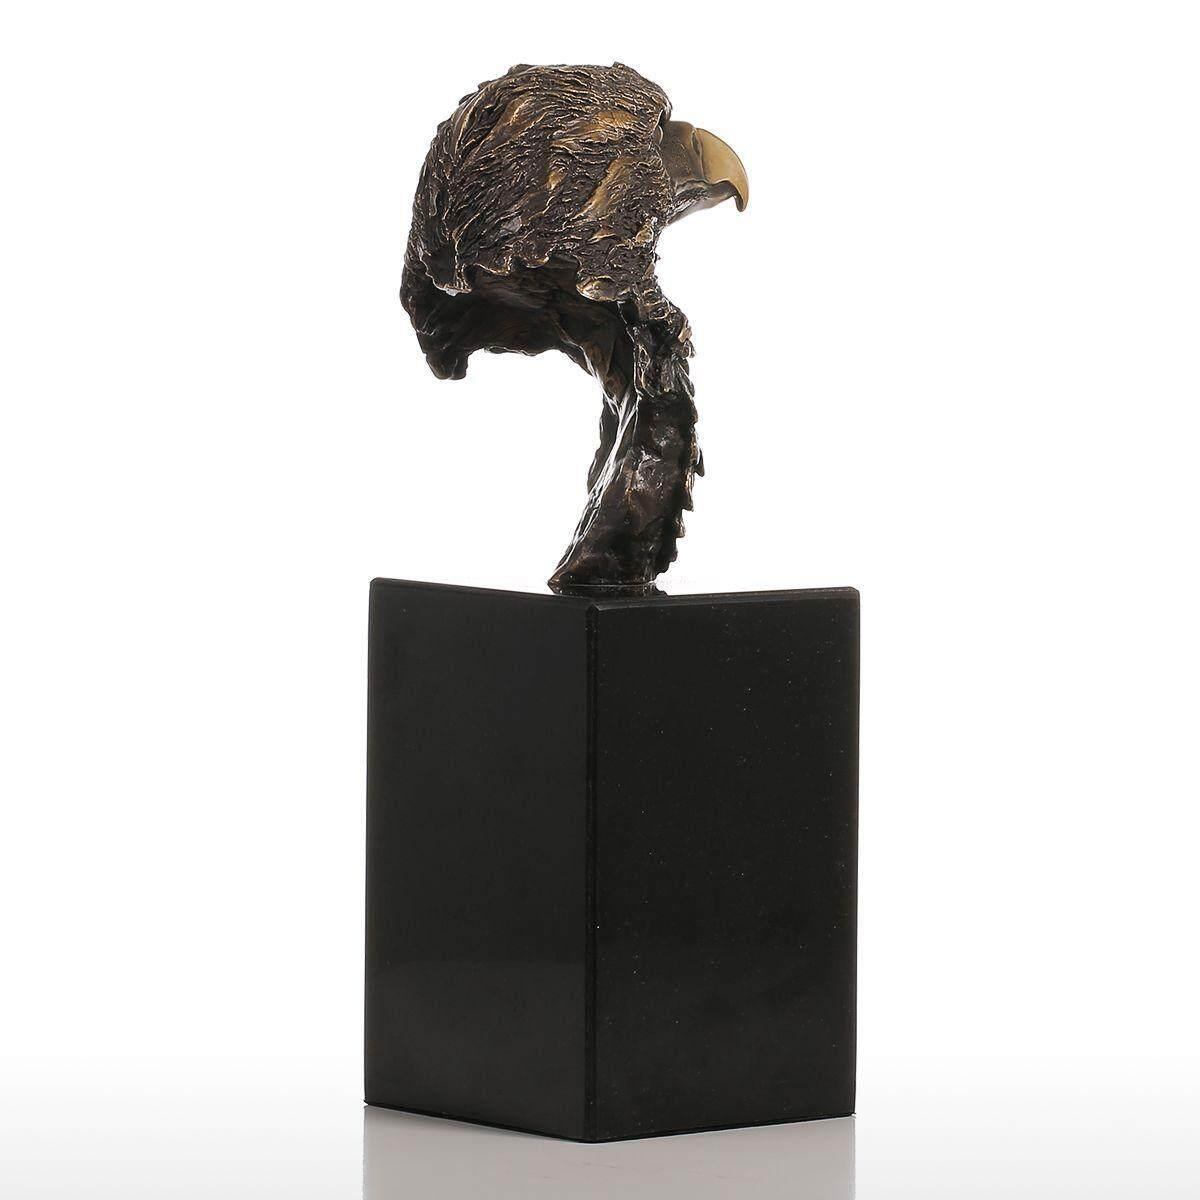 Tooarts Marble Base Elang Ekor Baji Buatan Tangan Patung Perunggu Modern Seni Dekorasi Rumah Patung Hadiah